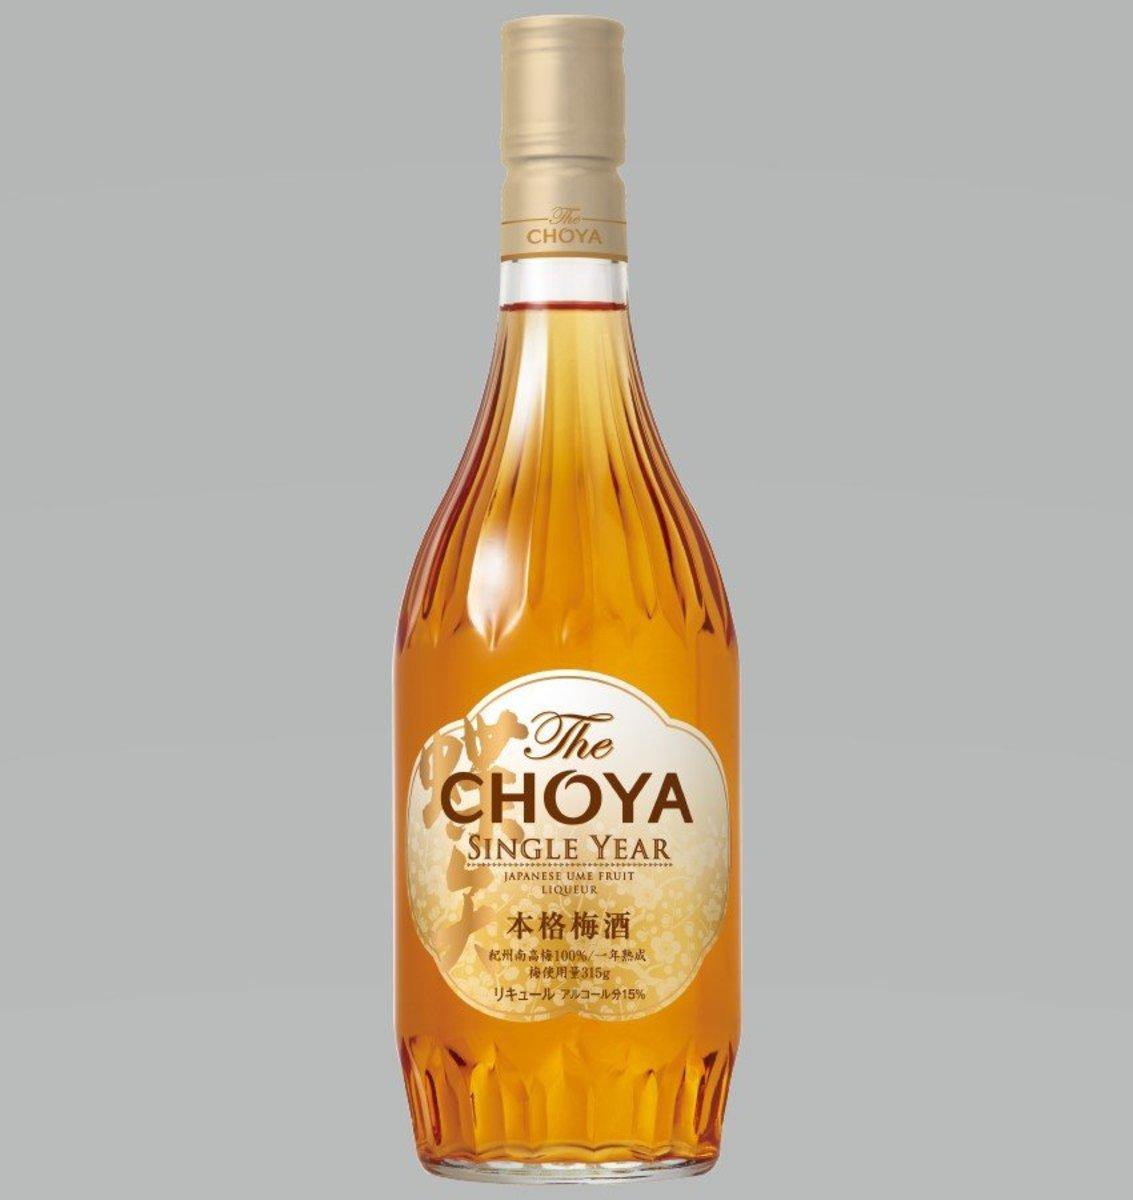 (Parallel)Cho Choya plum drink SINGLE YEAR 720 ml